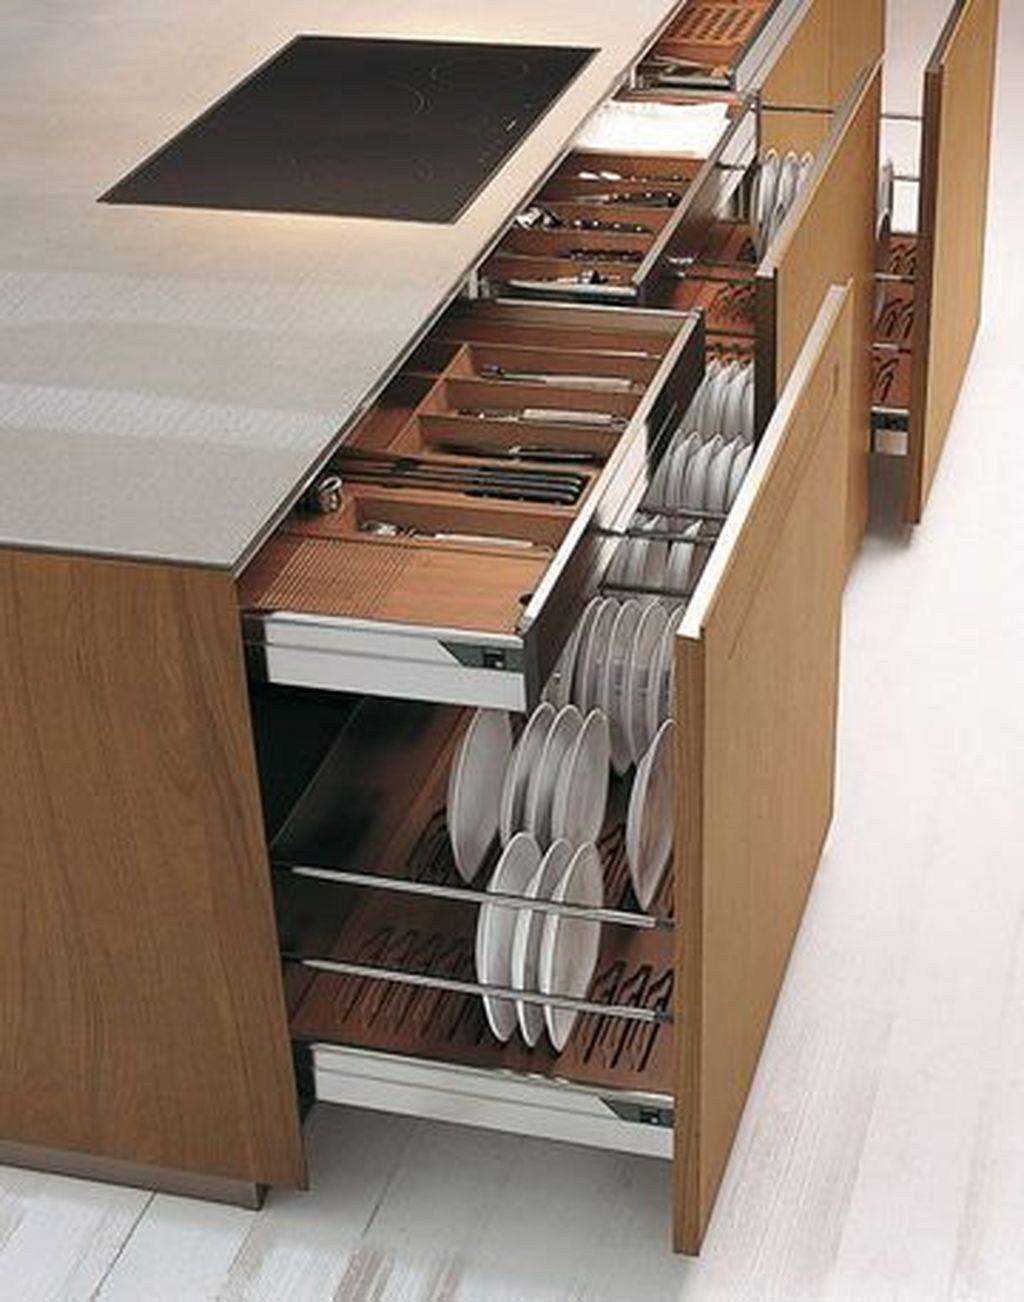 Kitchen Cabinets Display Ideas